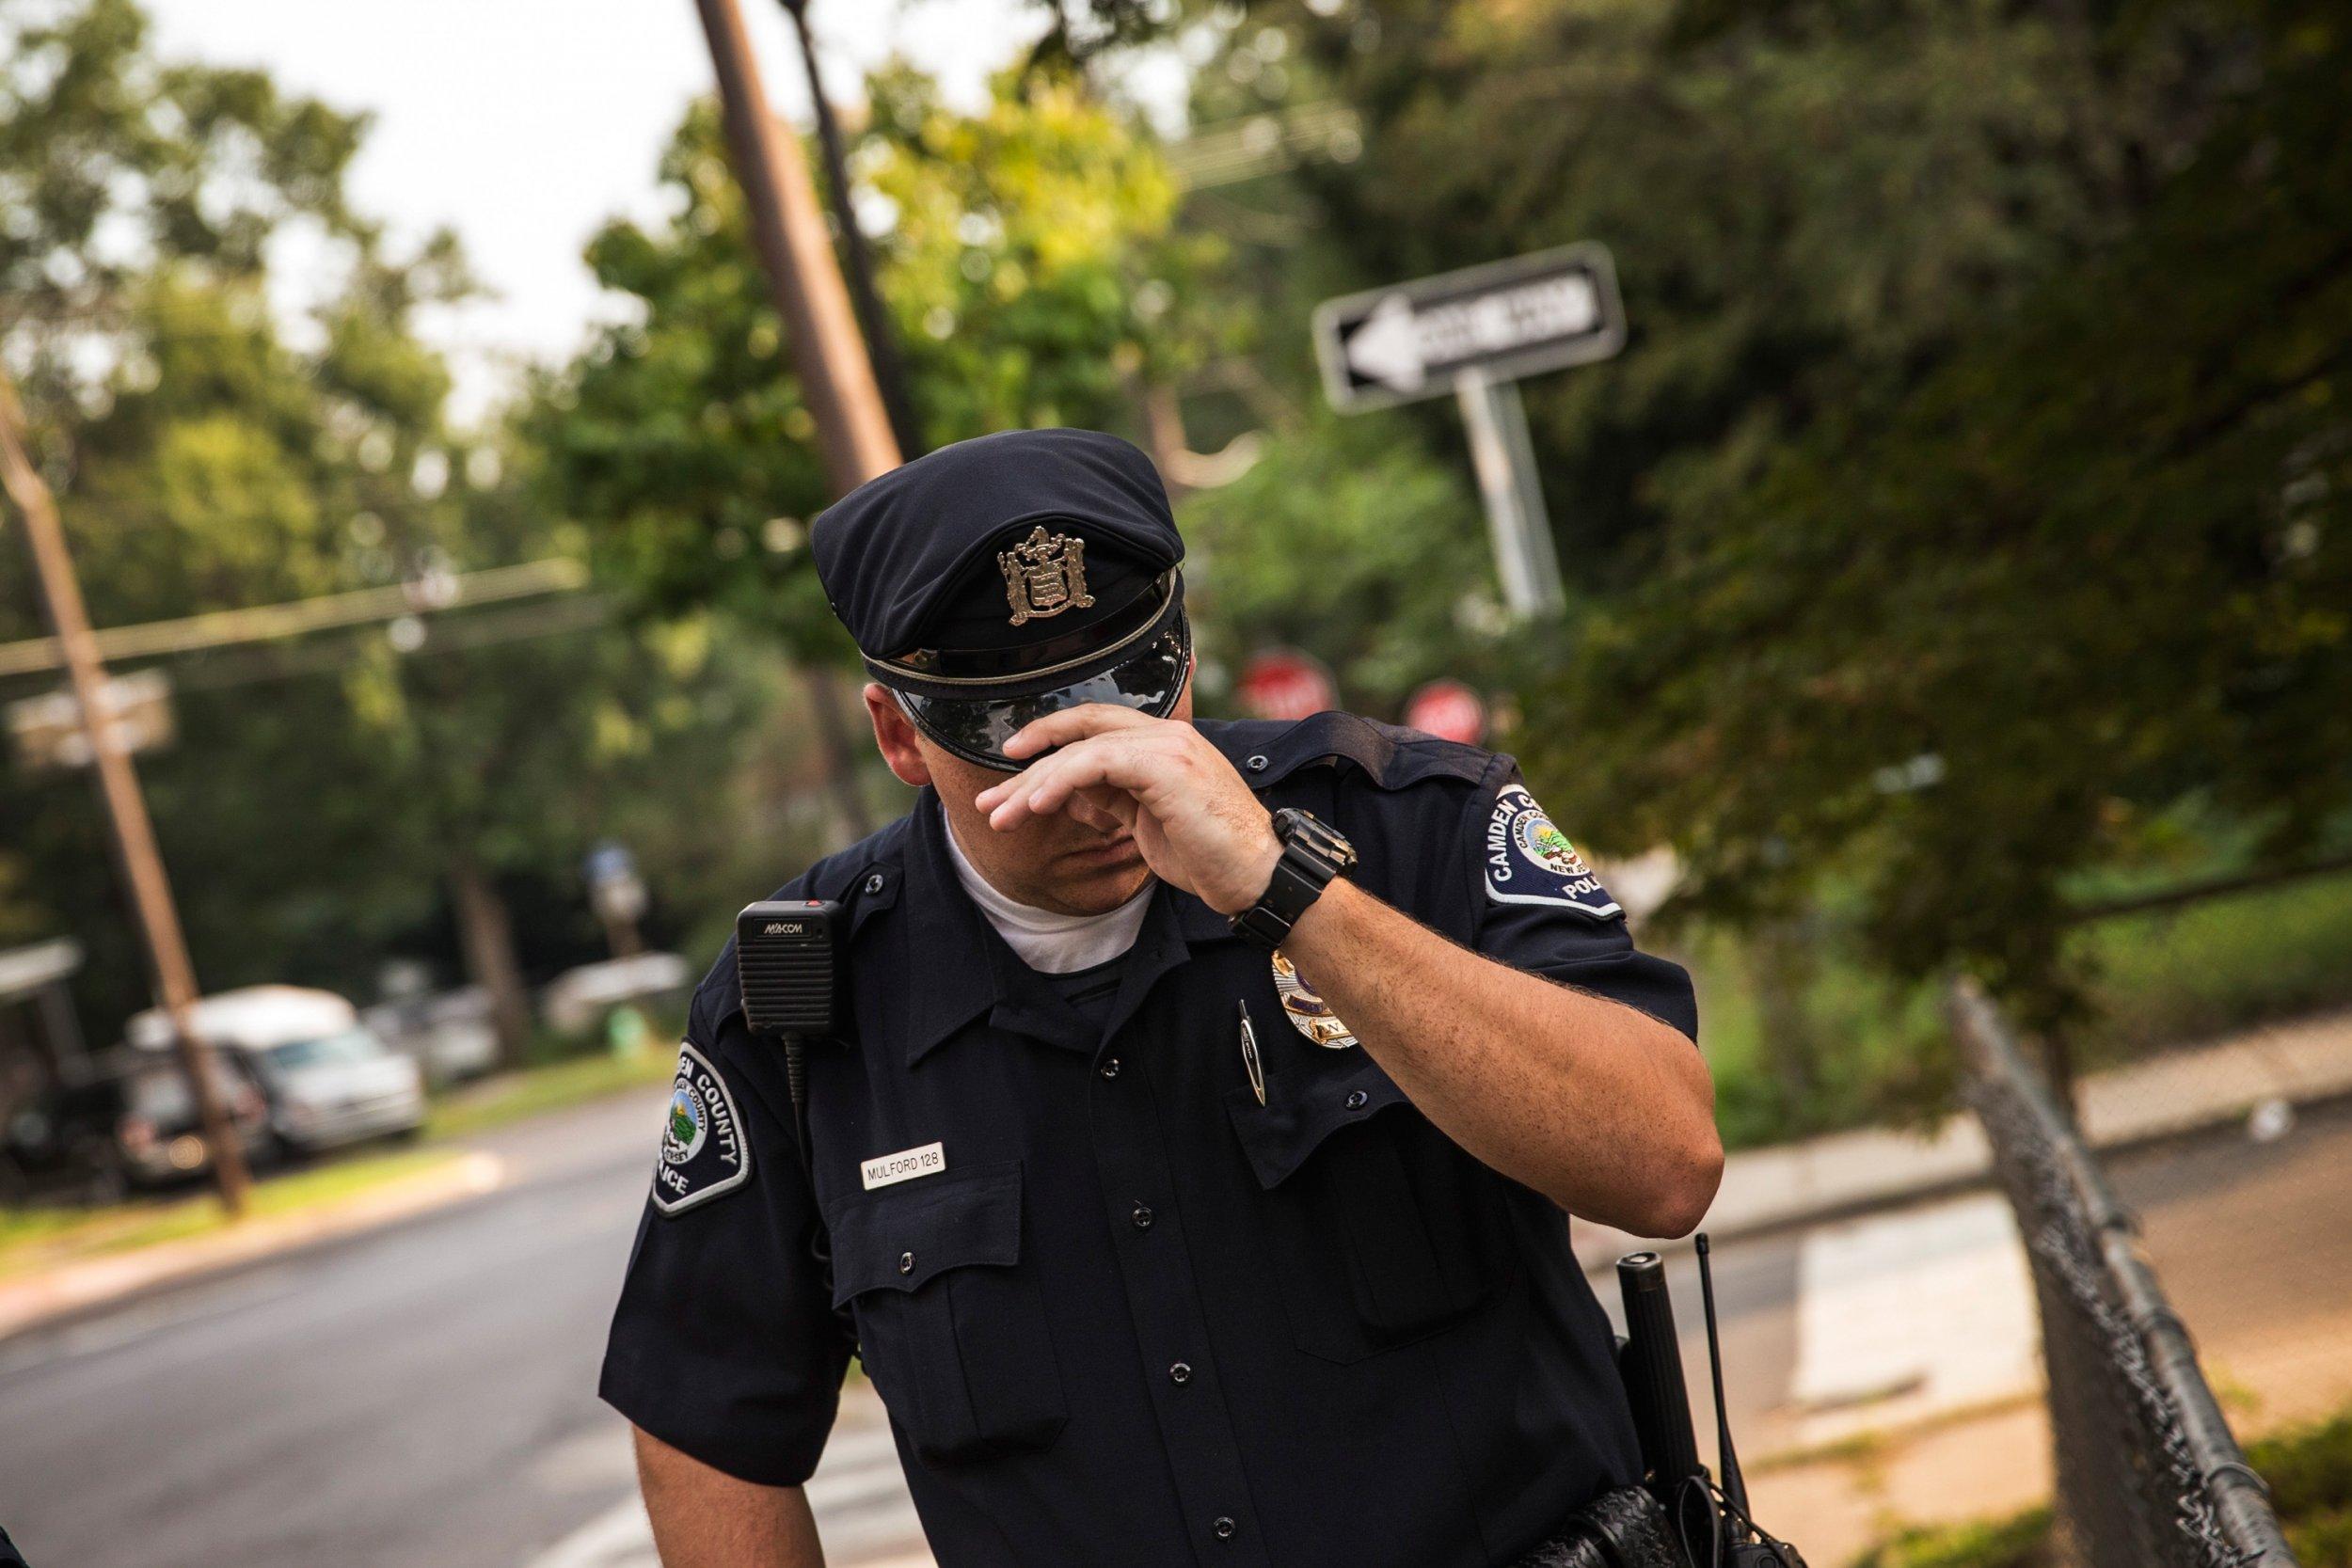 Ambush Camden Police Shooting: Chief Credits 'Grace of God' After